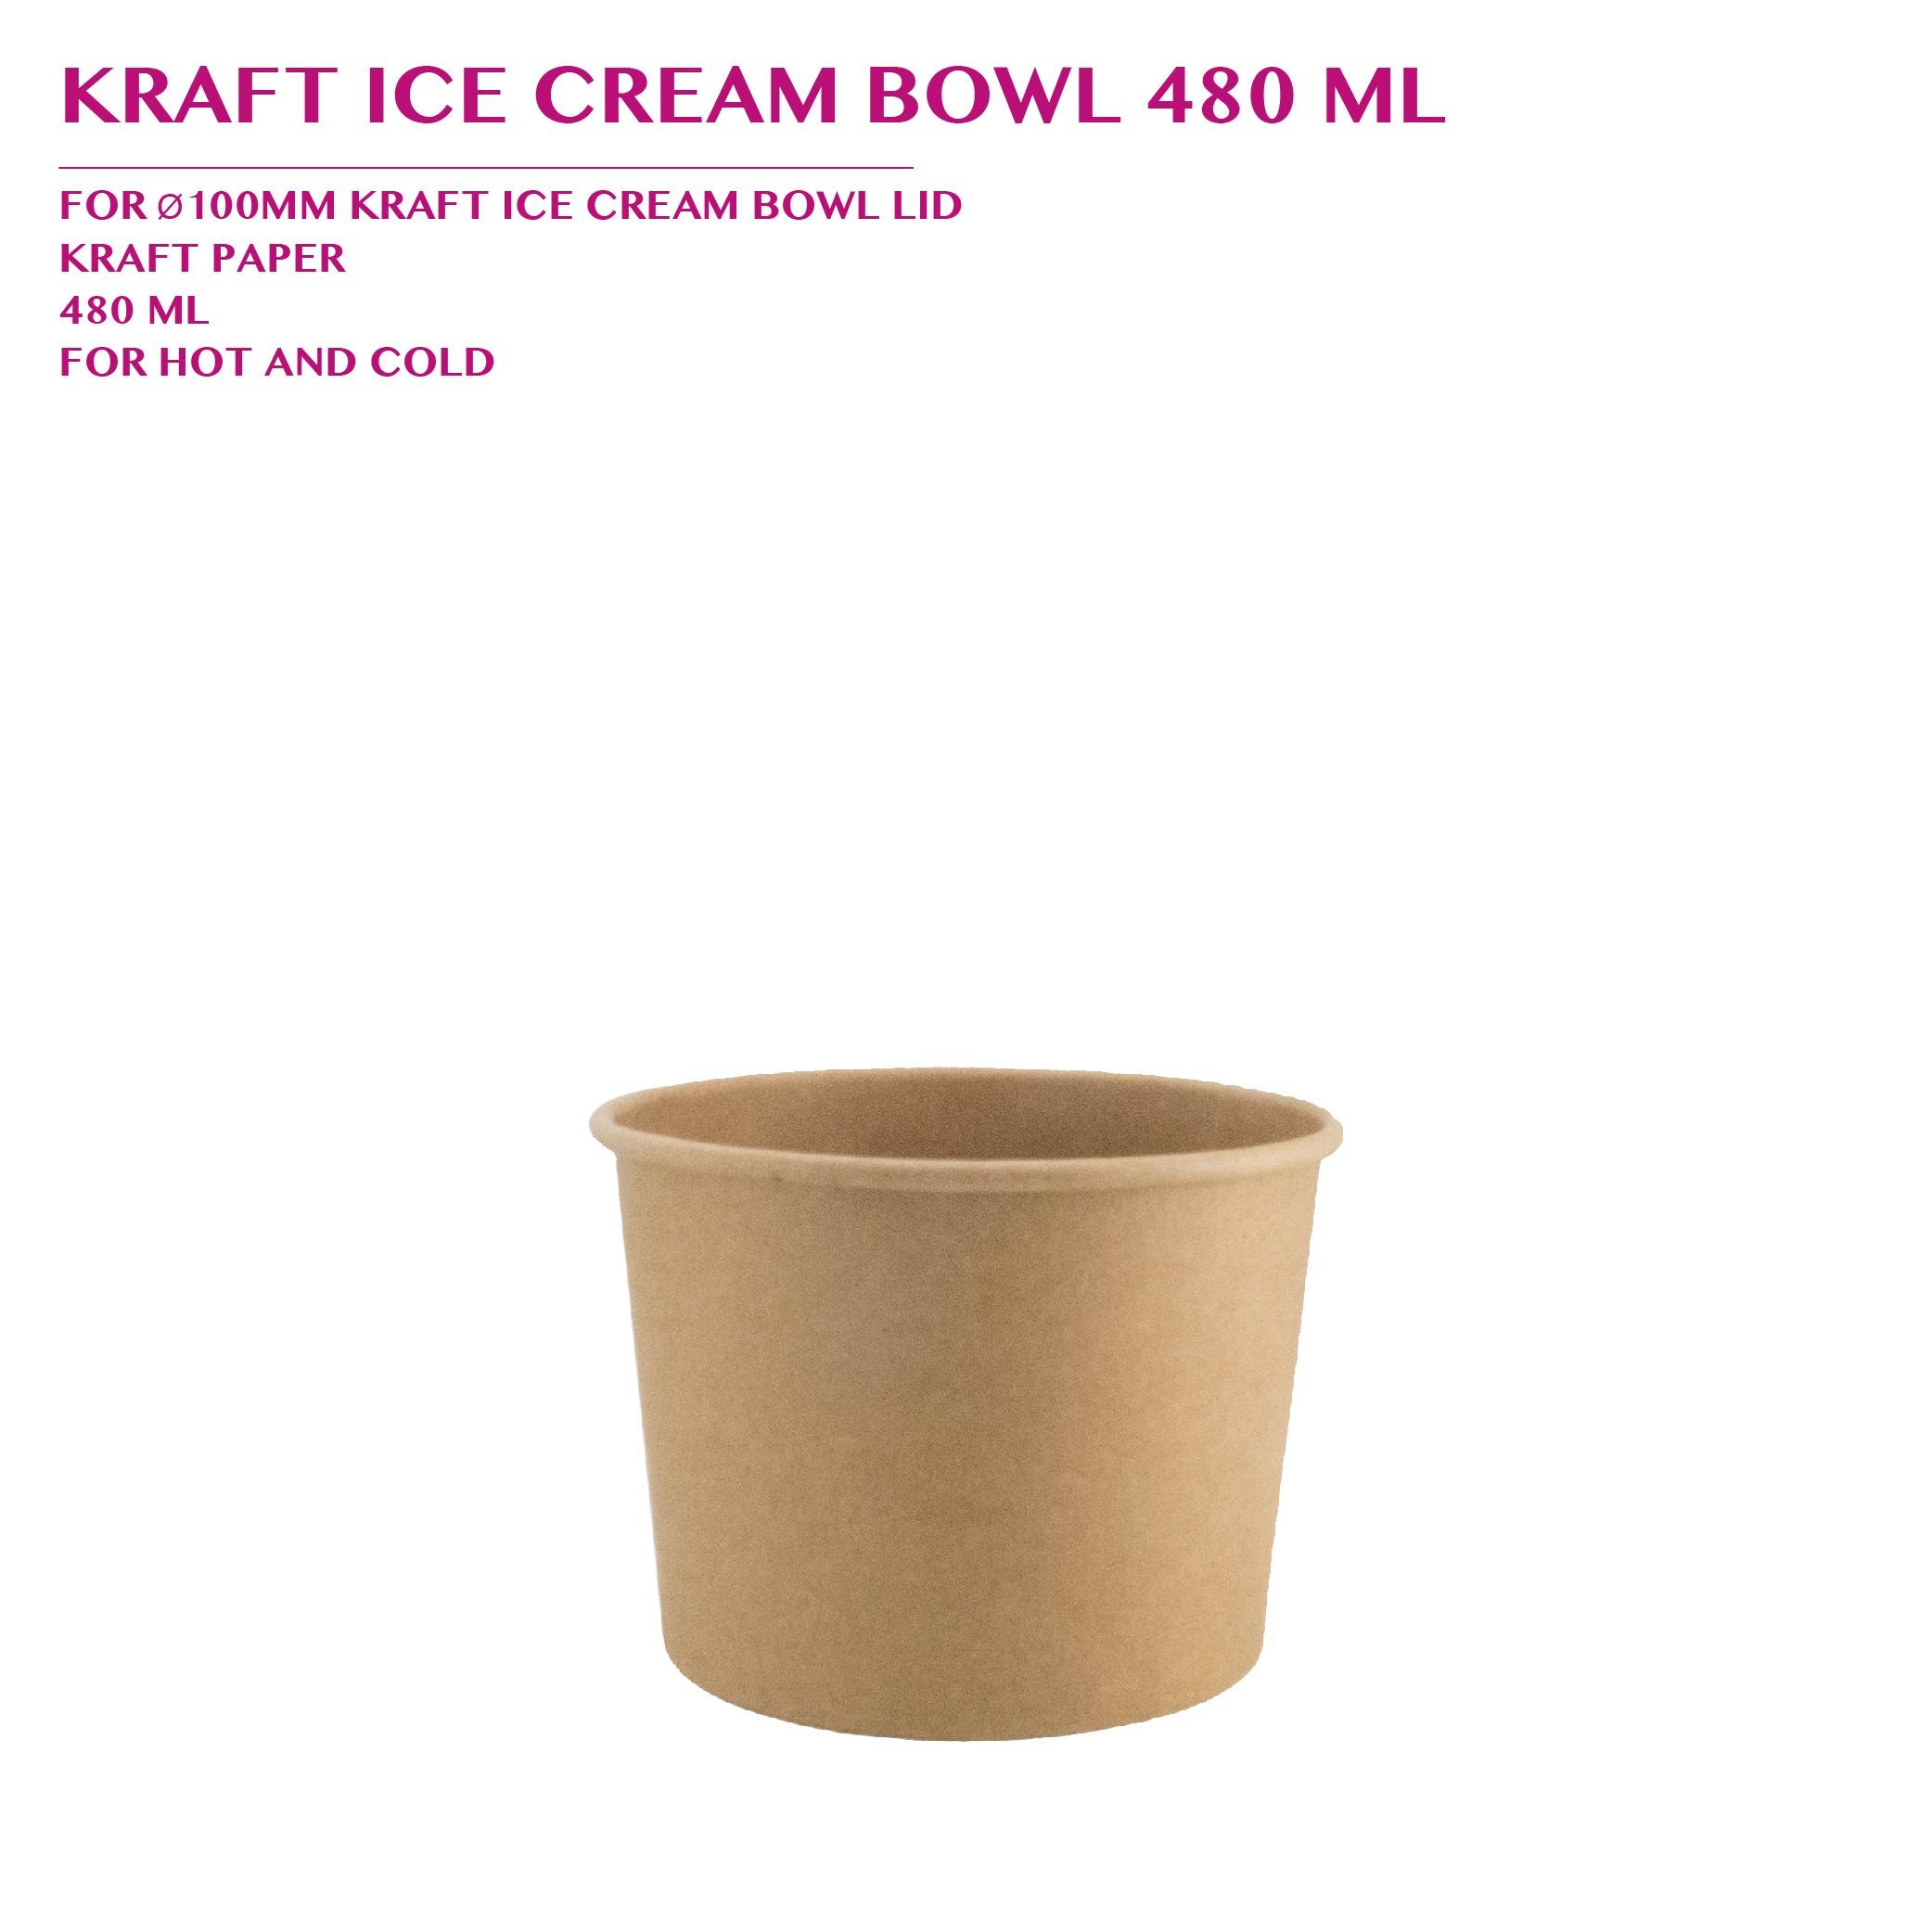 PRE-ORDER KRAFT ICE CREAM BOWL 480 ML PCS/CTN